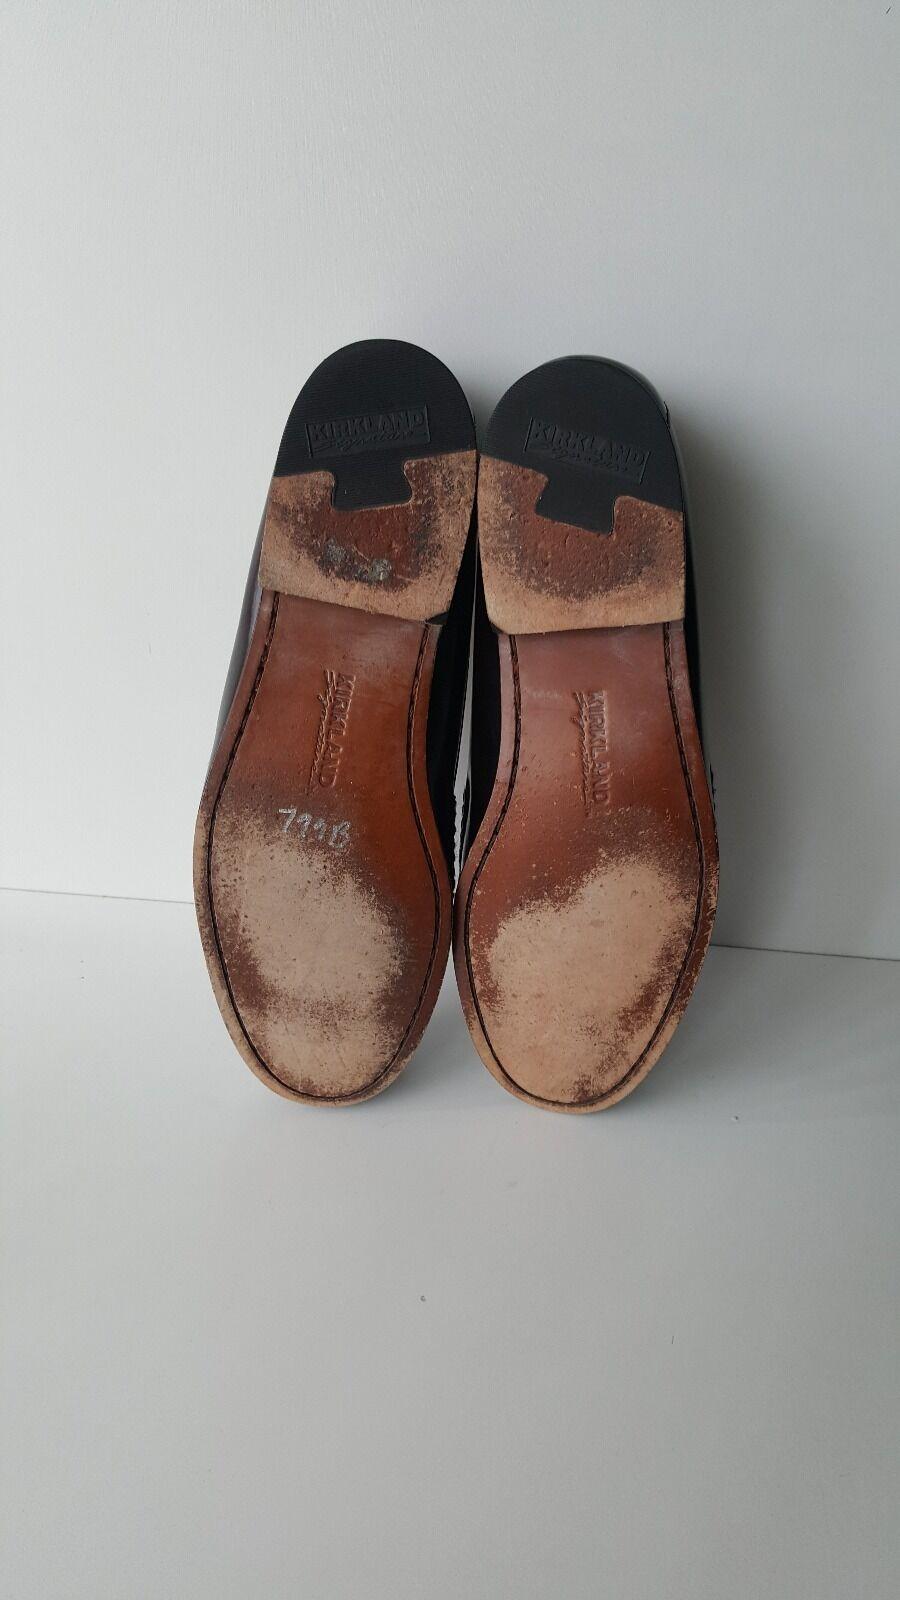 Kirkland Signature Ox Blood Leather Dress Fashion Fashion Fashion Strap Mocs Penny Loafers 13 D 904f58